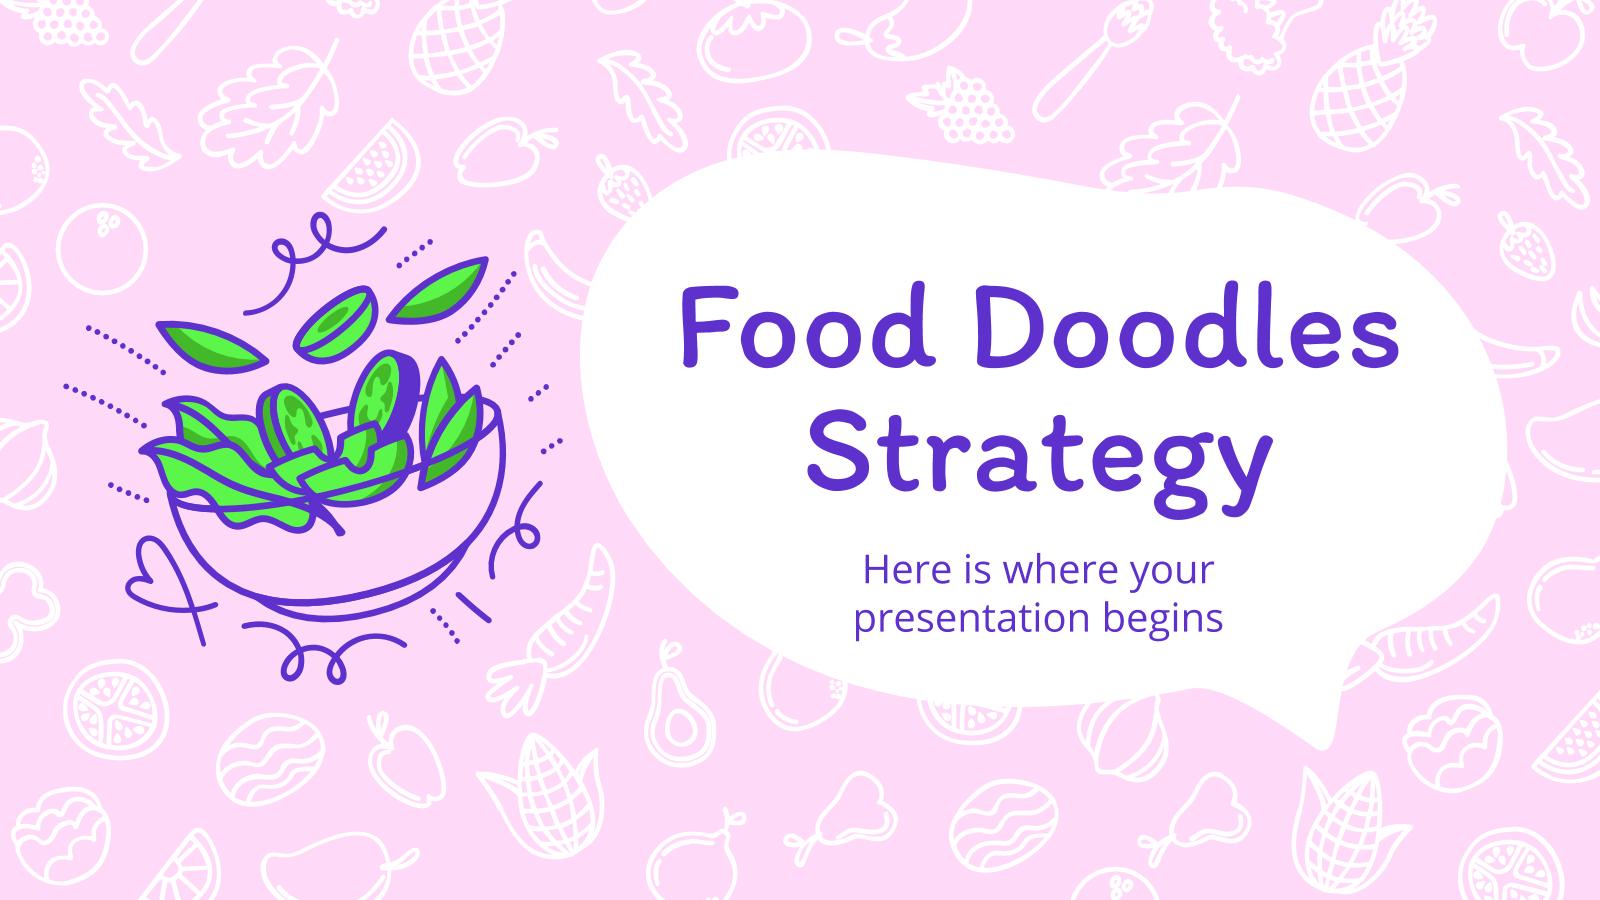 Plantilla de presentación Diapositivas de marketing con doodles de alimentos